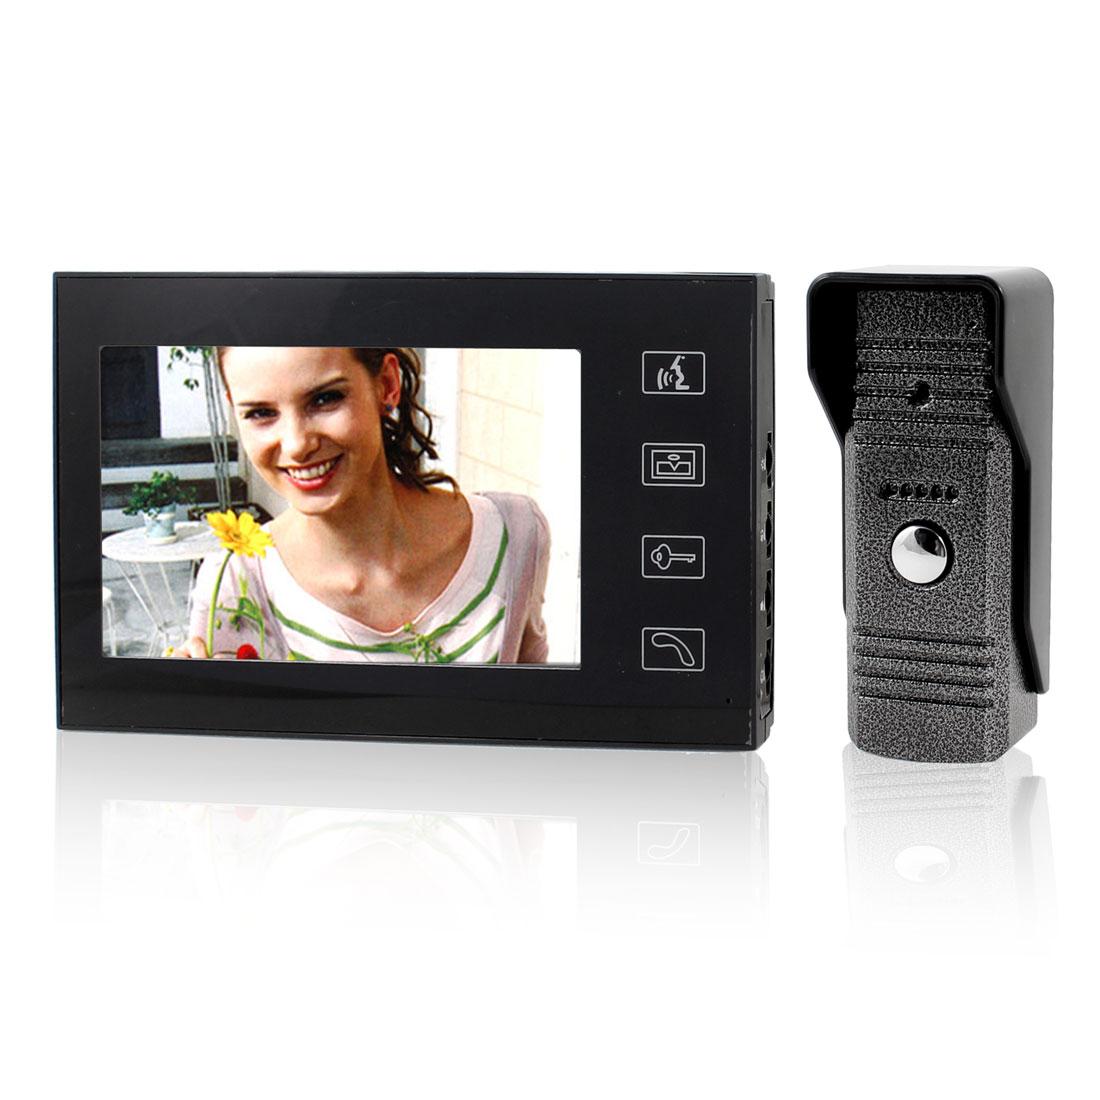 "7"" TFT LCD Display Home Security Intercom IR Monitor Video Door Phone US Plug"